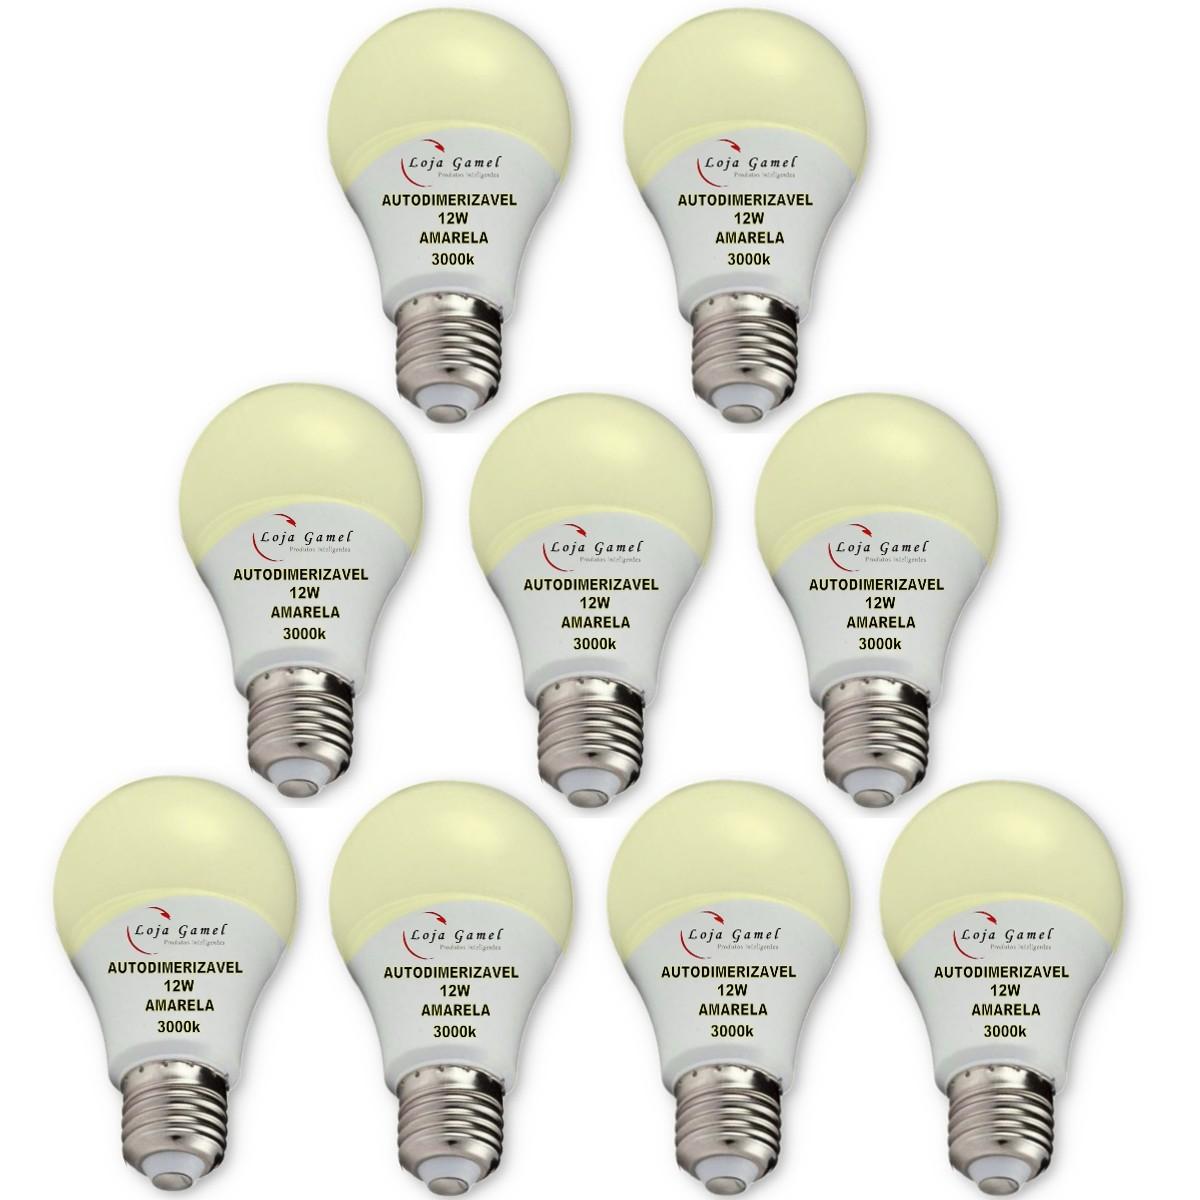 Foto 1 - Lâmpada LED Bulbo Autodimerizável 12W Luz Amarela 3000K Kit 9un